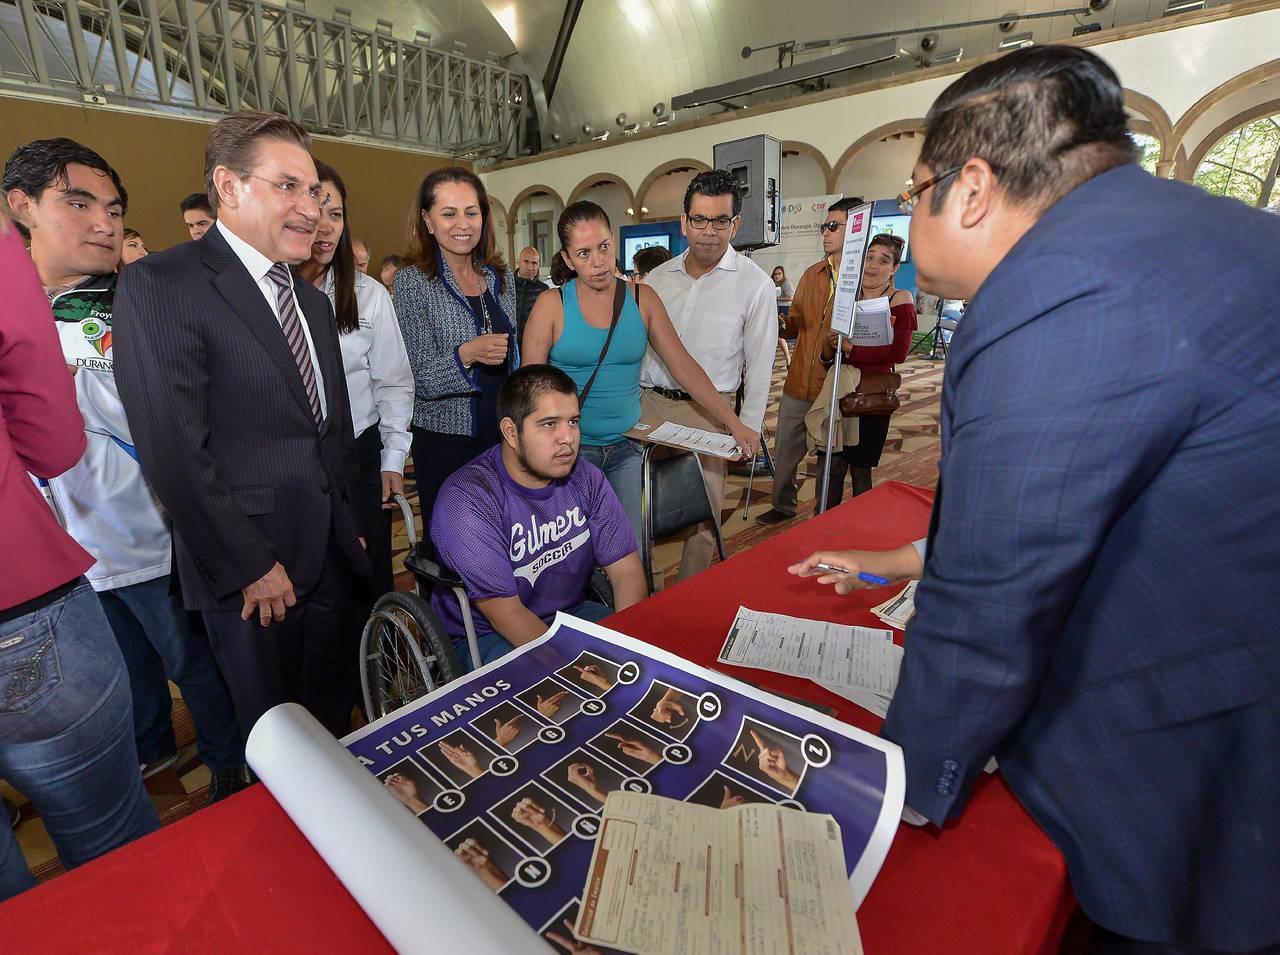 Oferta Durango empleo para discapacitados: AT